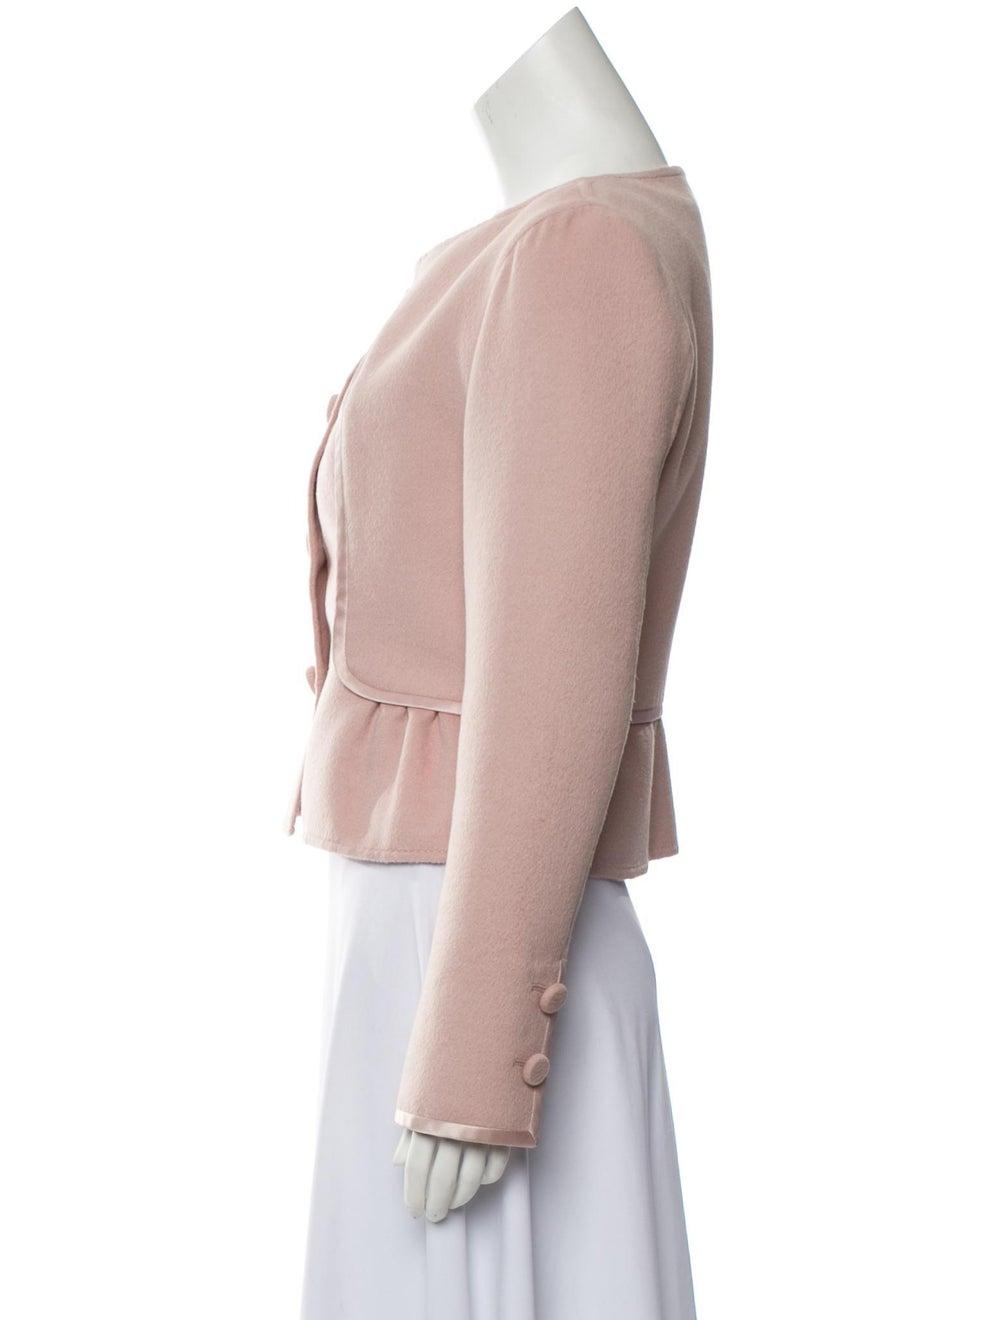 Valentino Wool Satin-Trimmed Jacket Pink - image 2